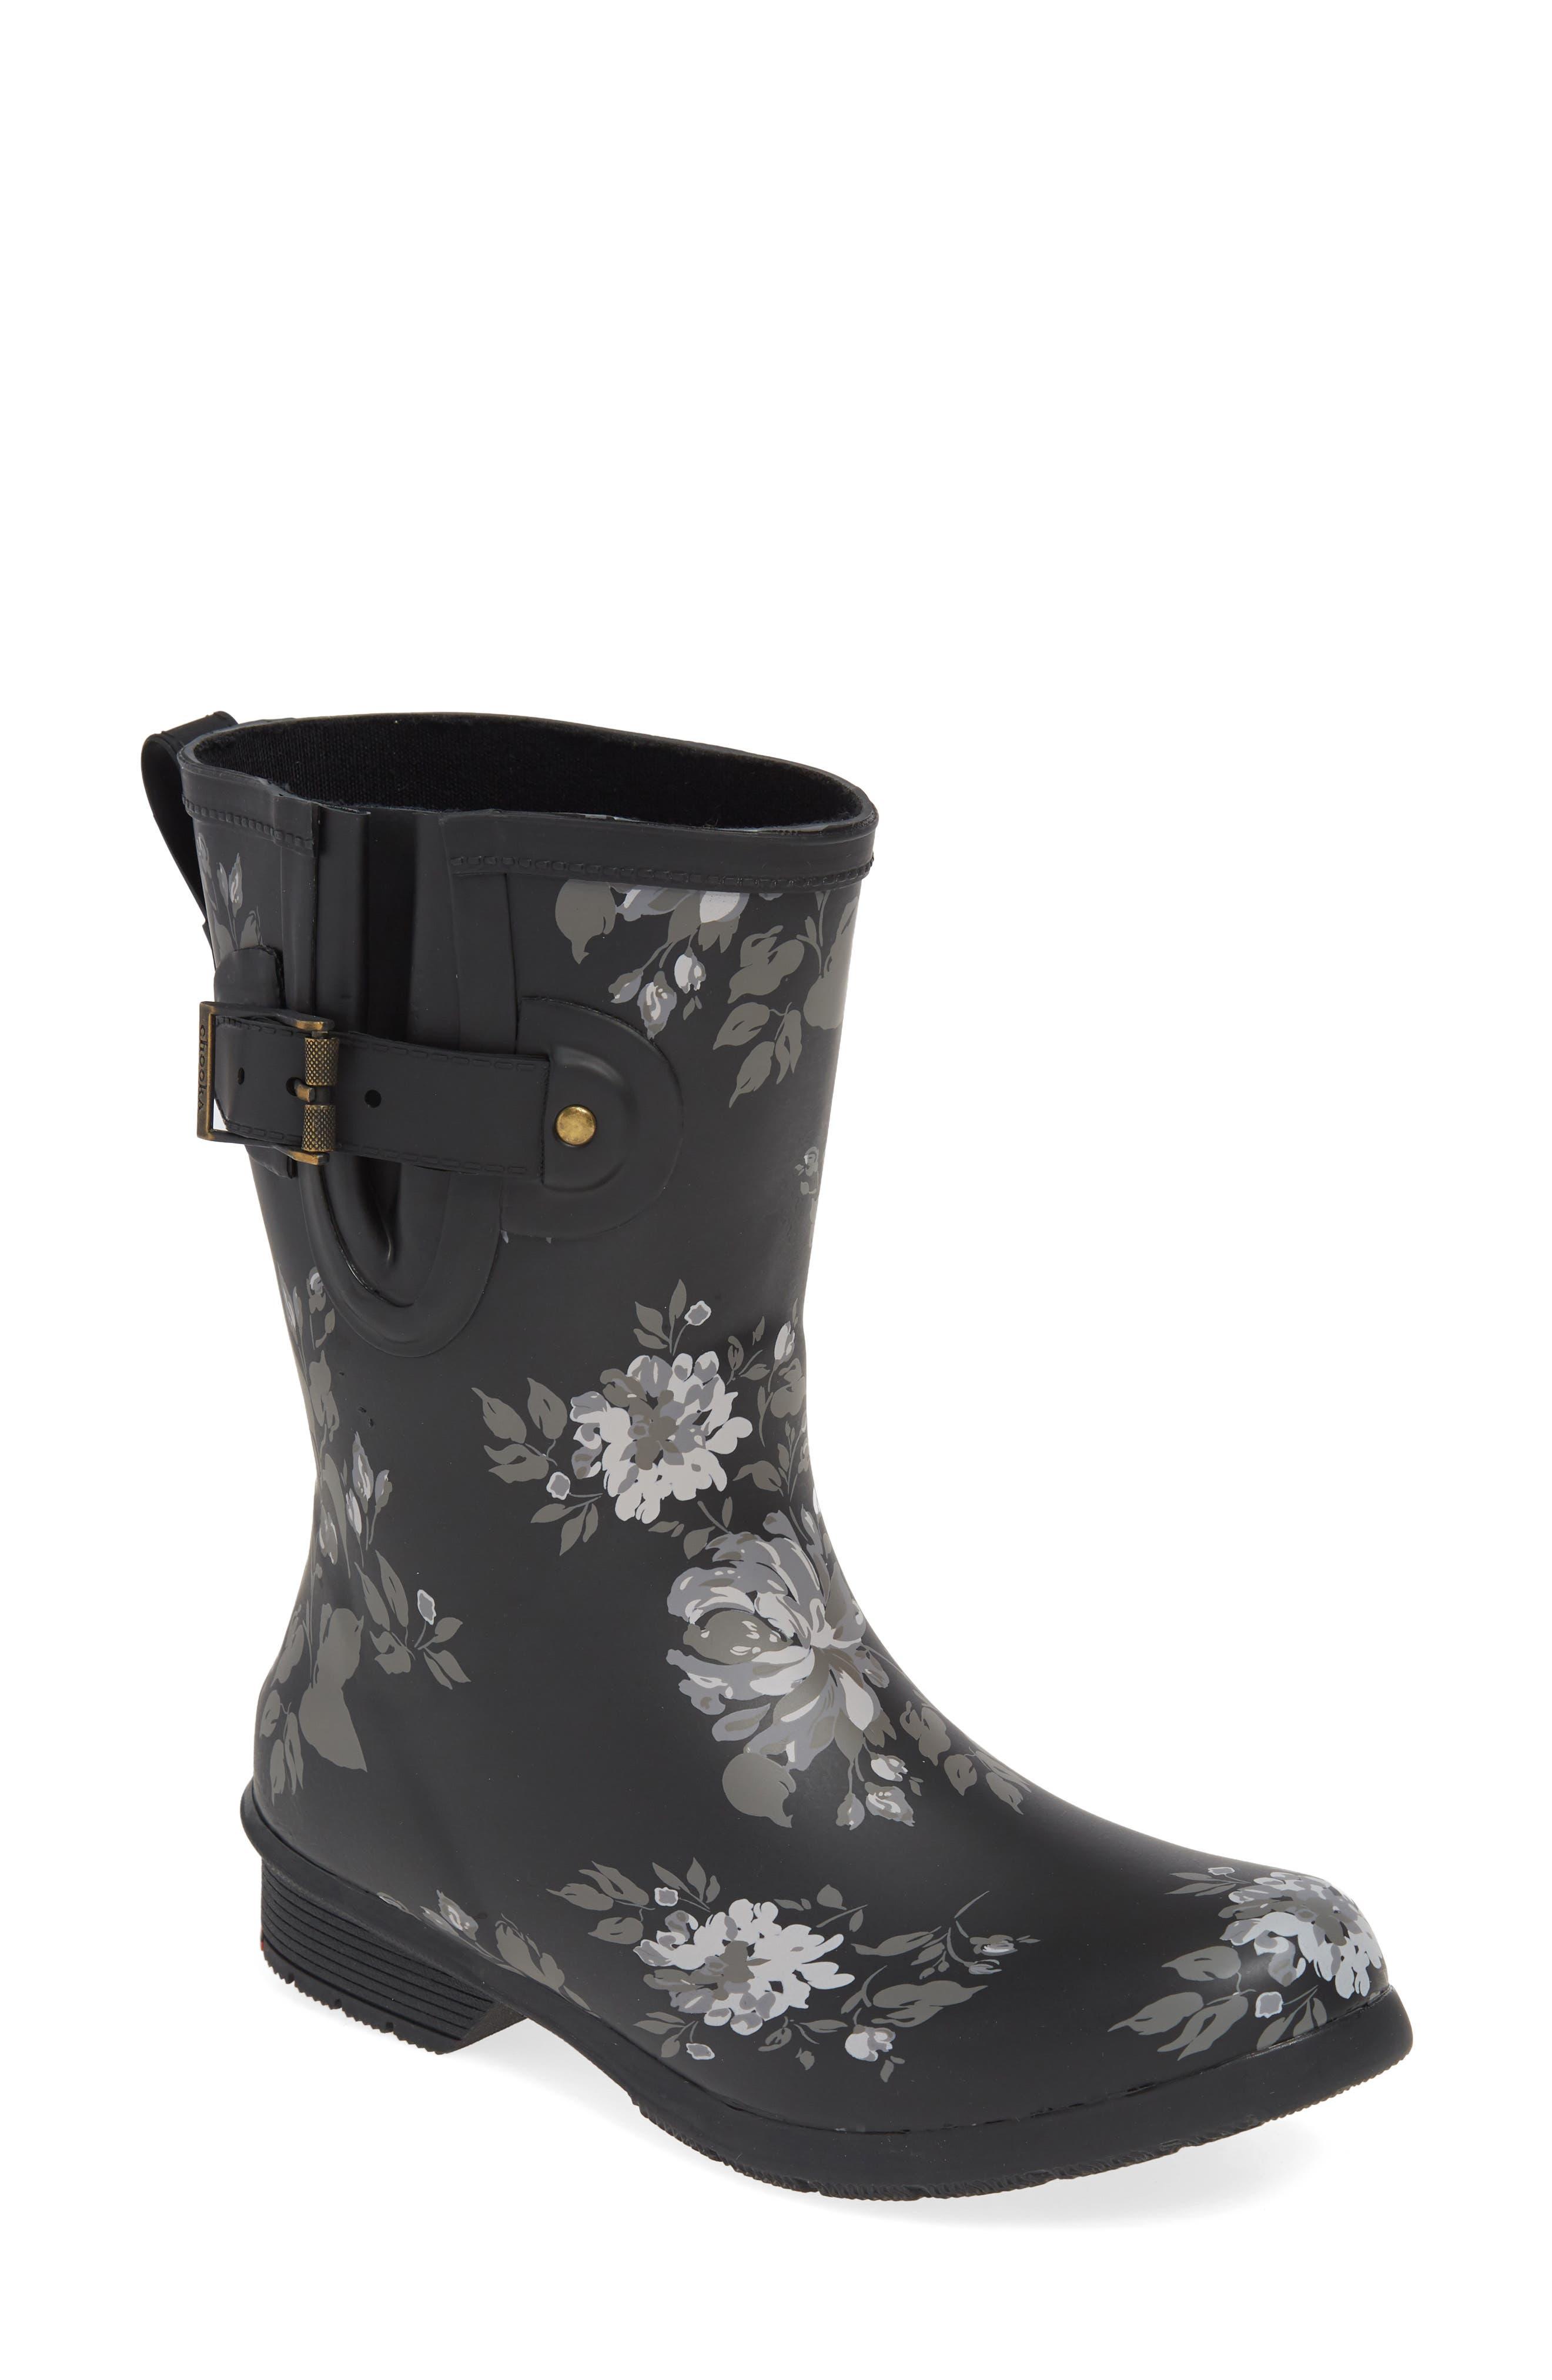 Chooka Abbie Waterproof Mid Rain Boot, Black